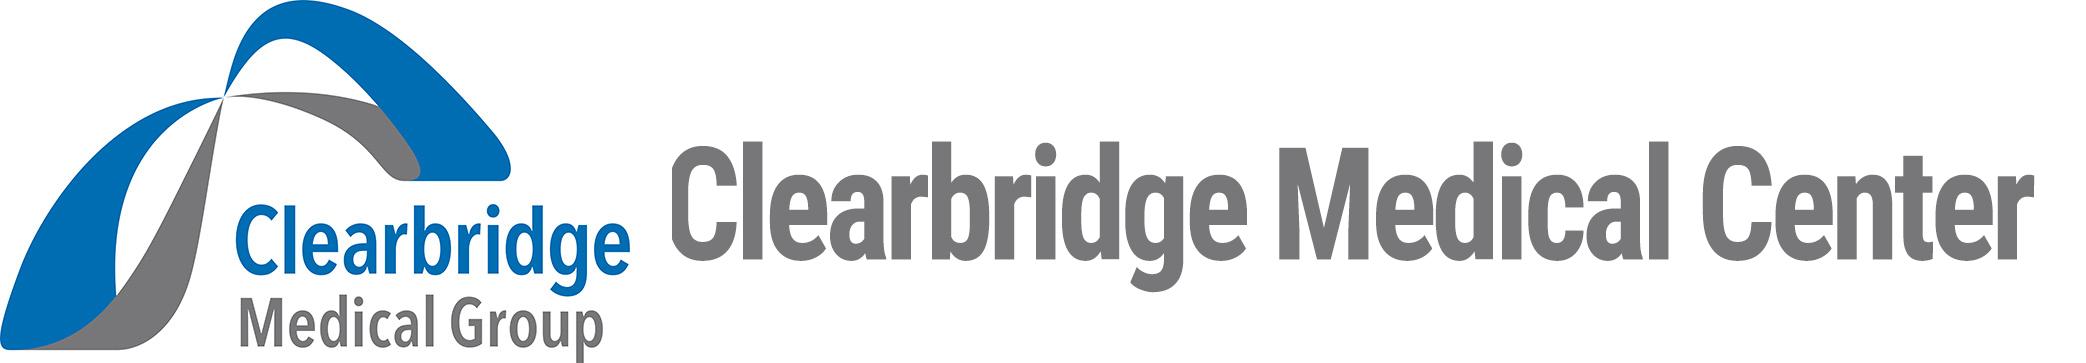 Clearbridge Medical Center